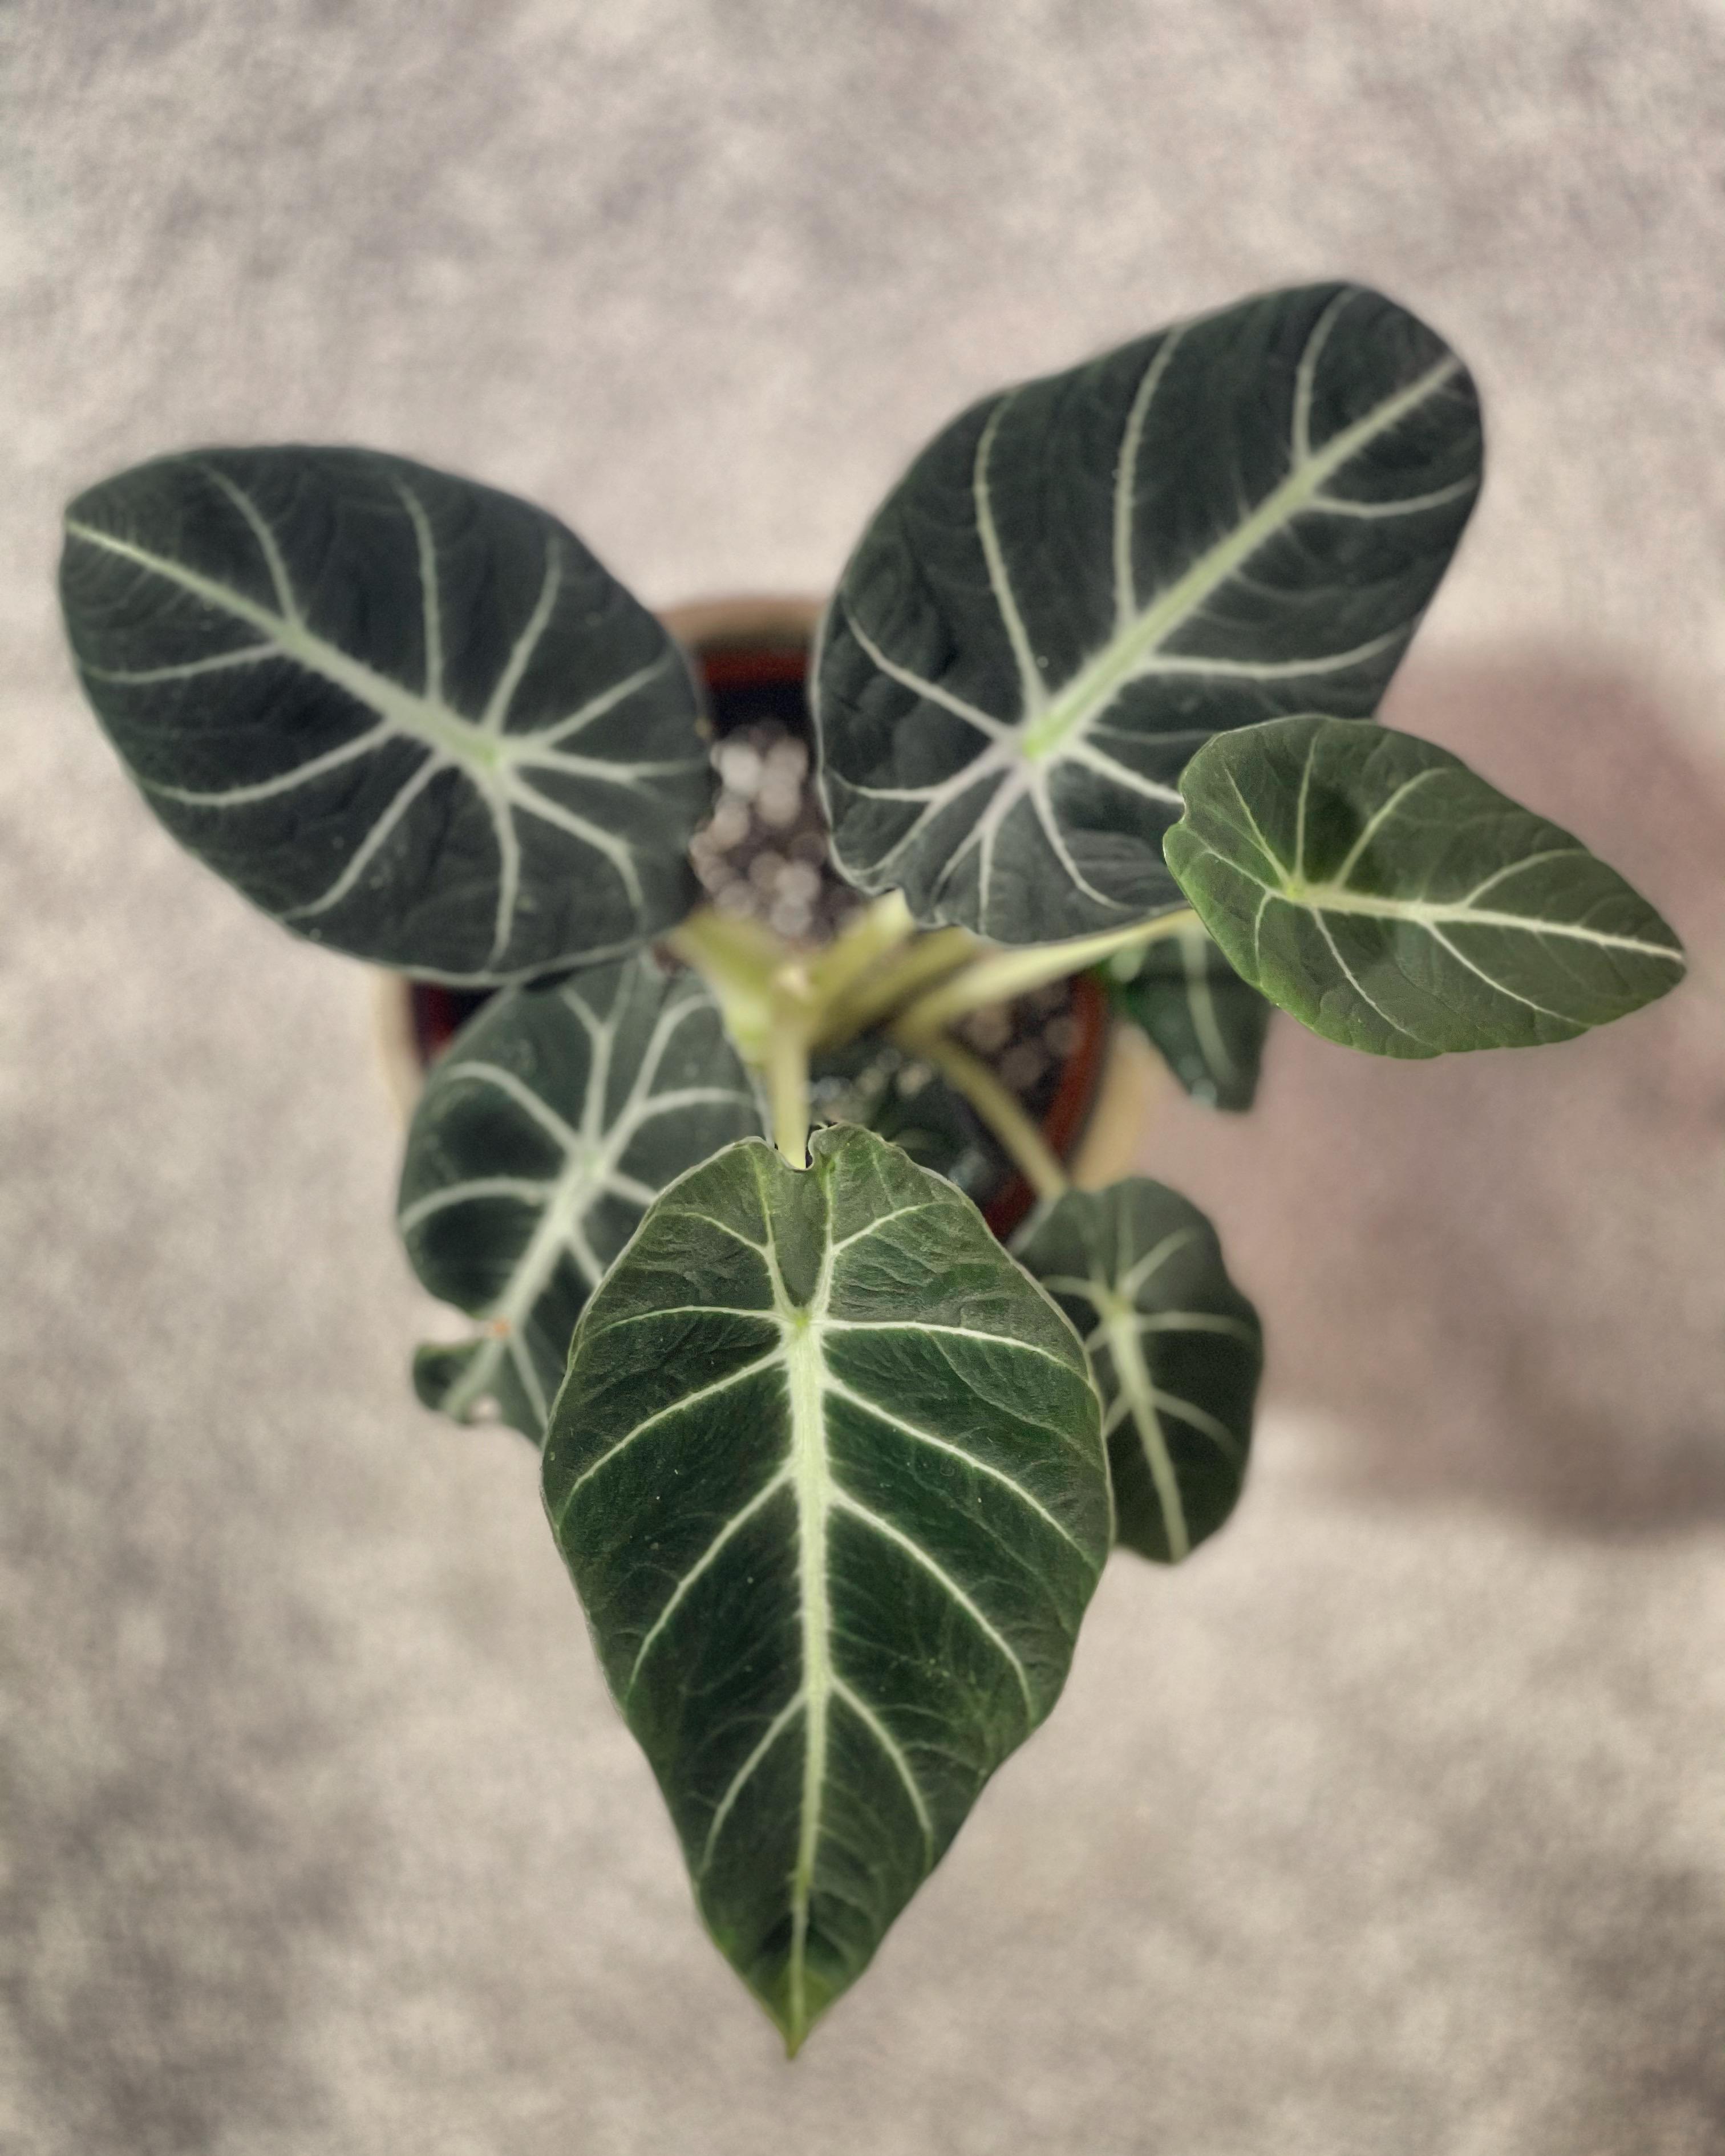 Plant Journal Alocasia Reginula Or Black Velvet Plant Principle